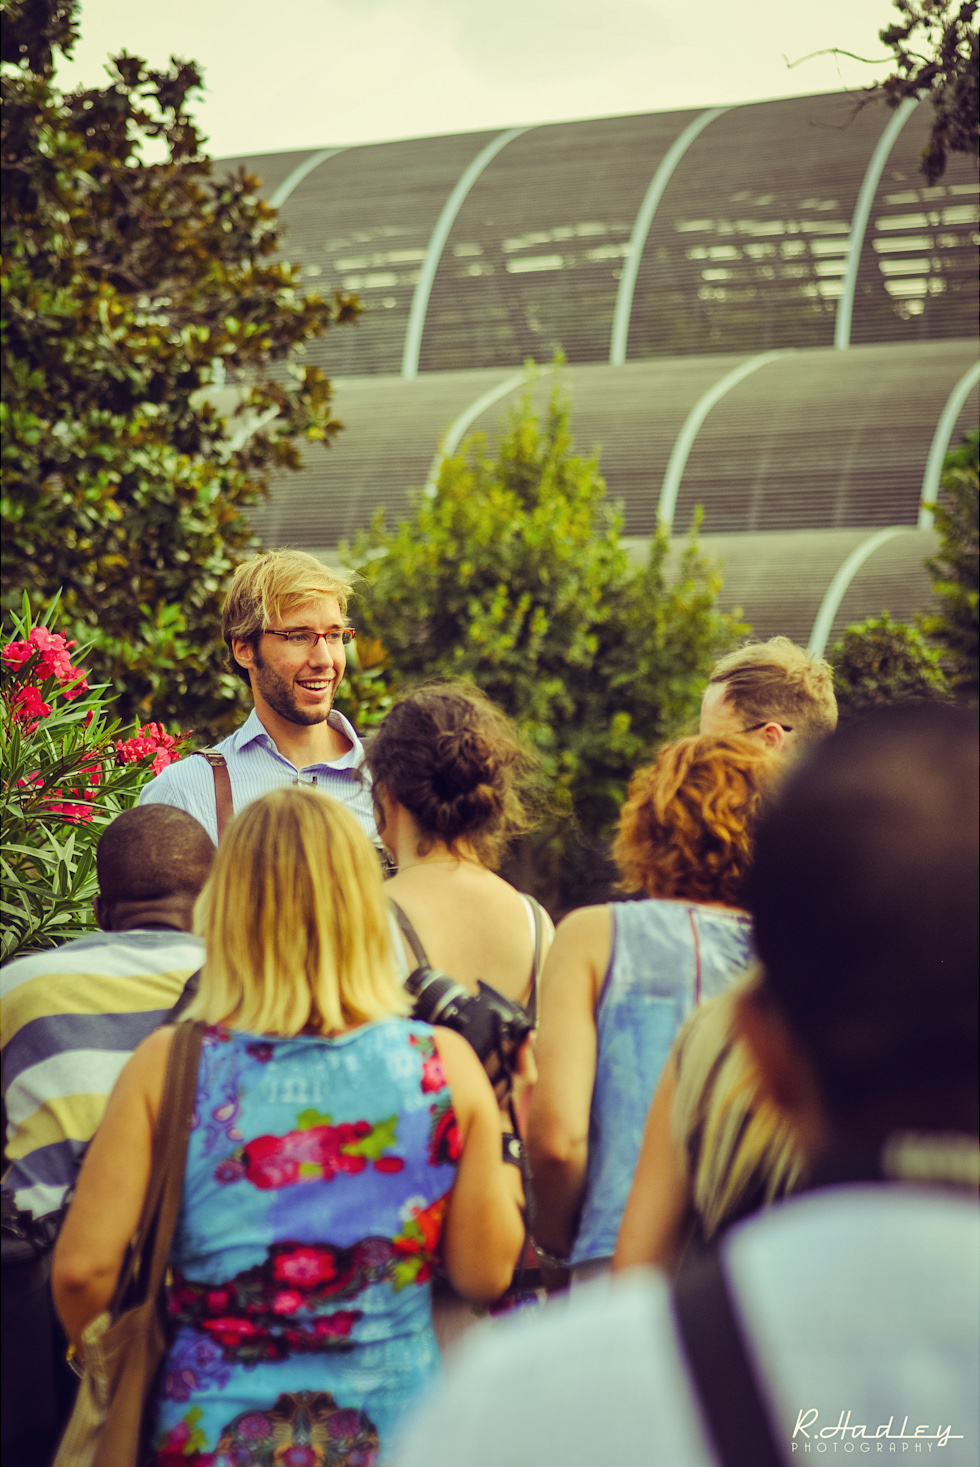 Portrait of Ben Evans teaching photography in Parc de la Ciutadella, Barcelona